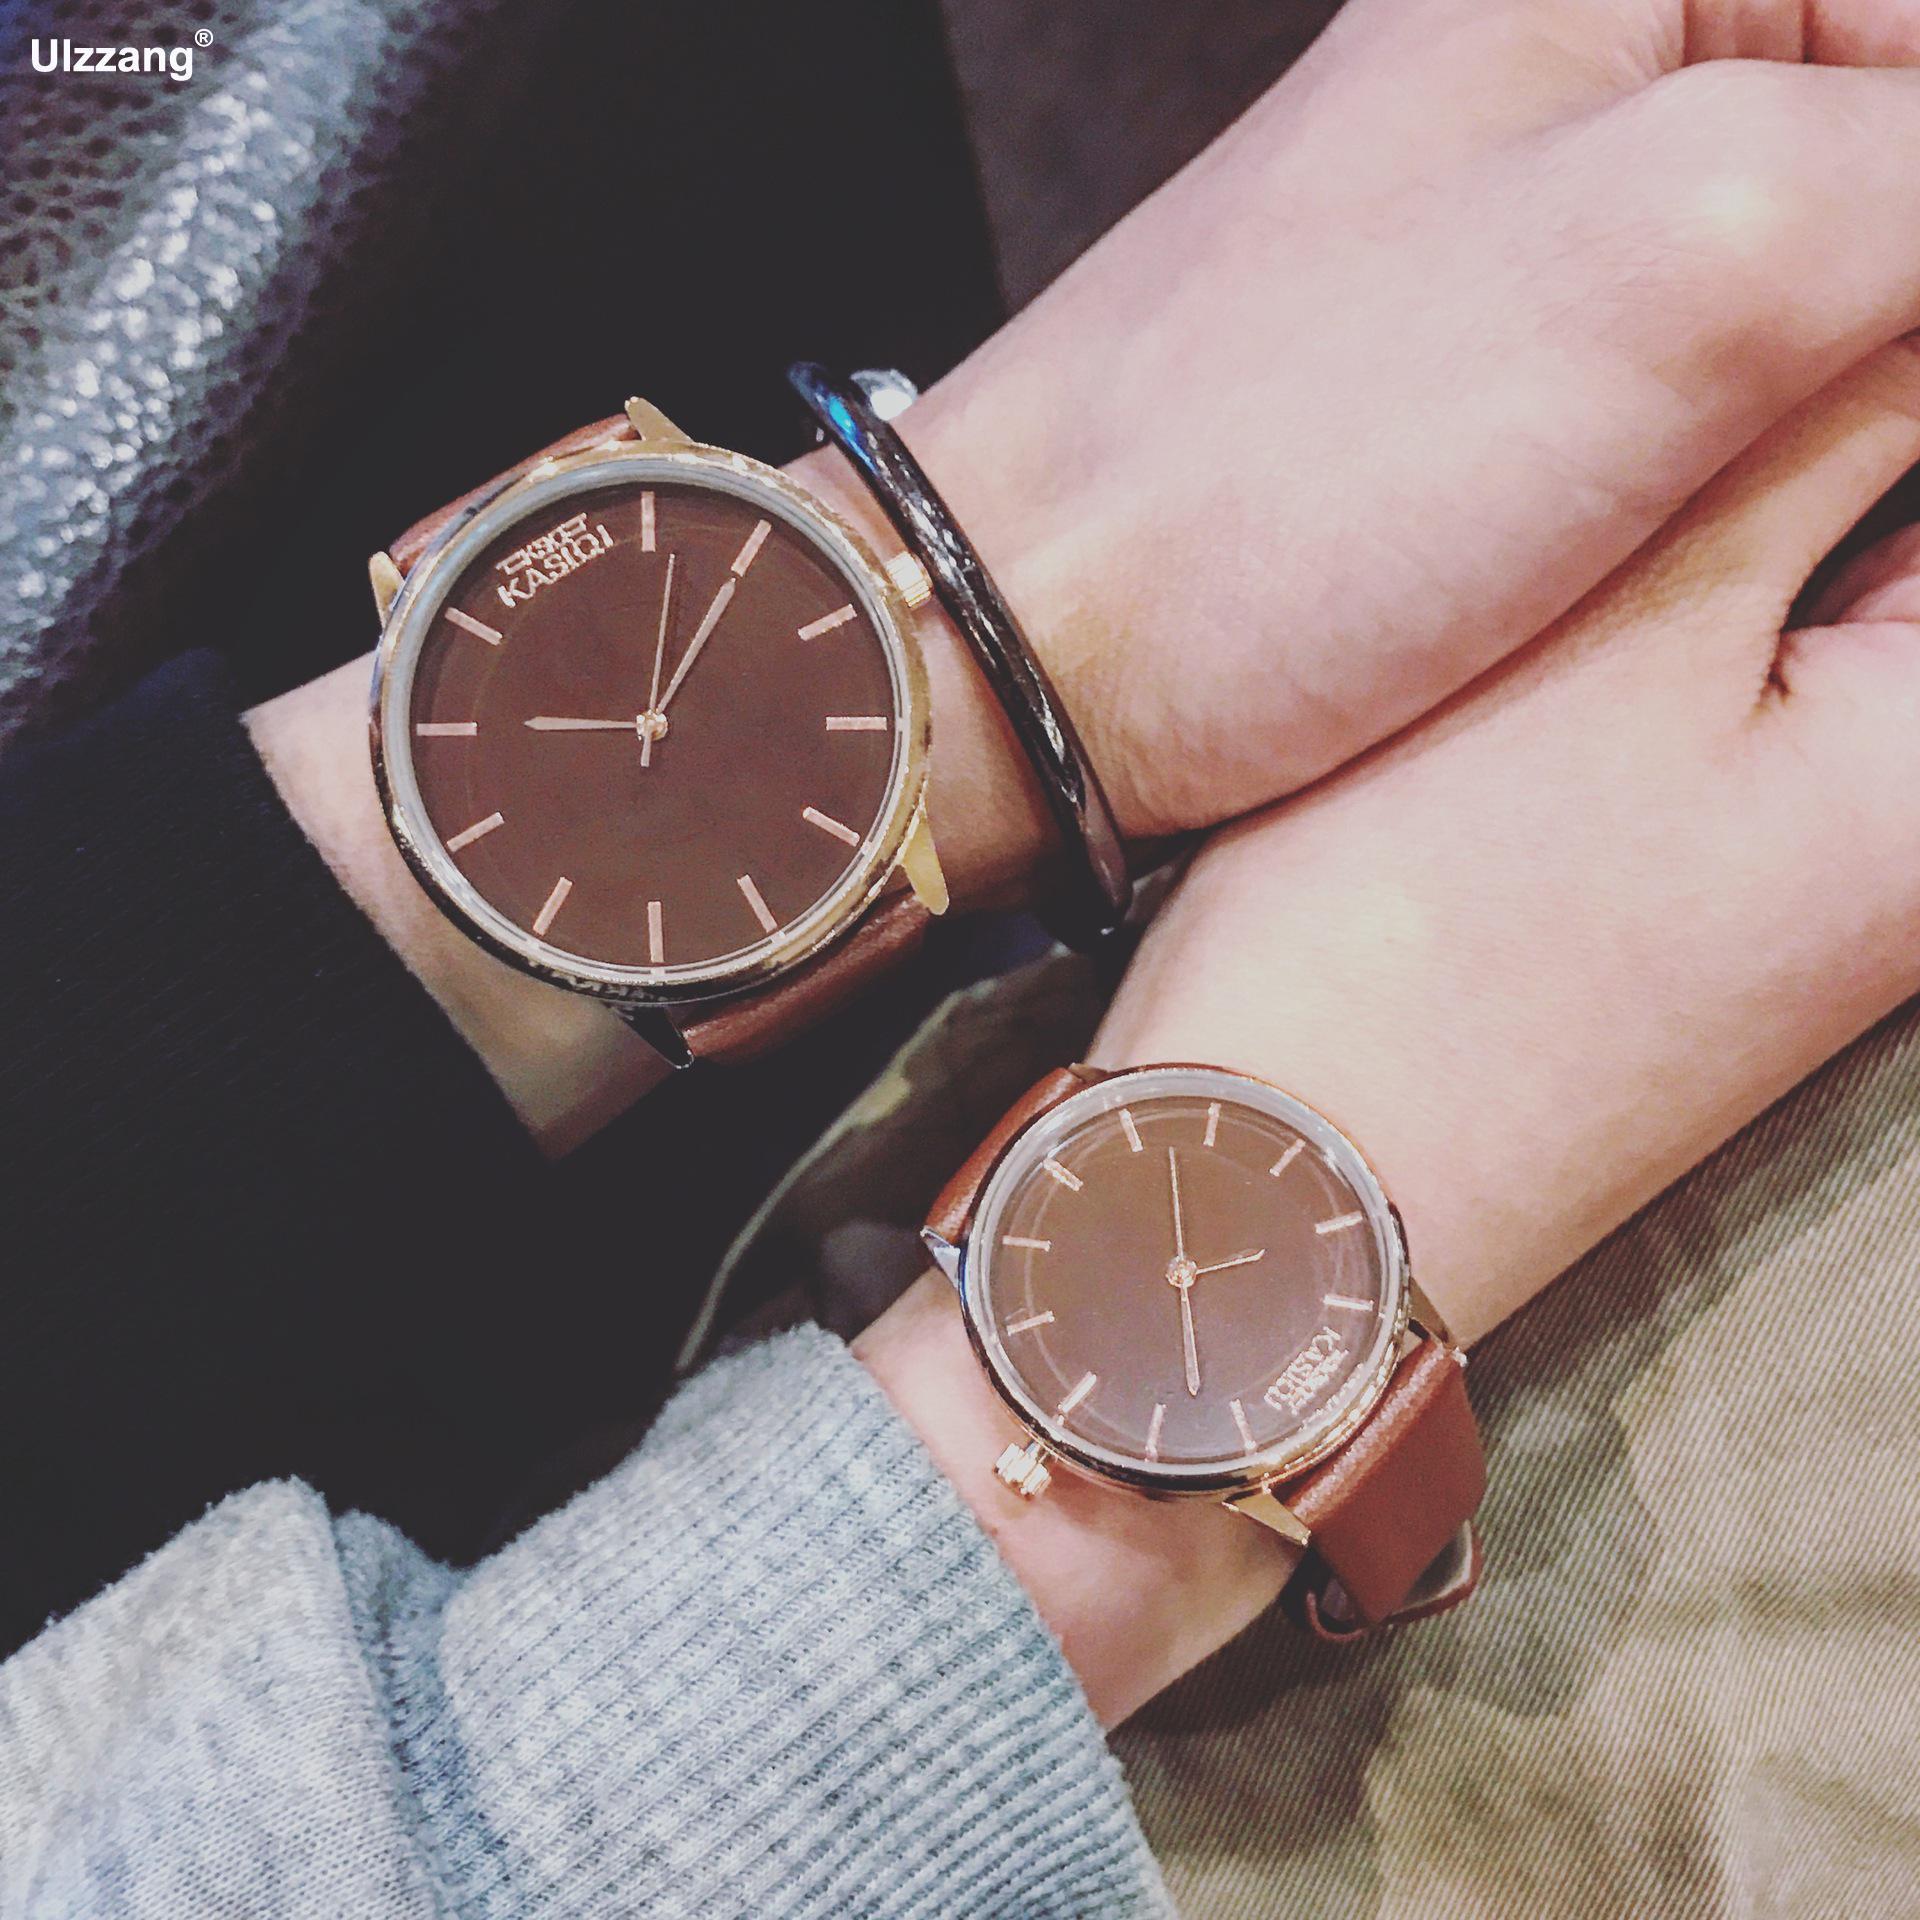 Top Brand Fashion Black White Watch Men Women Leather Quartz-watch